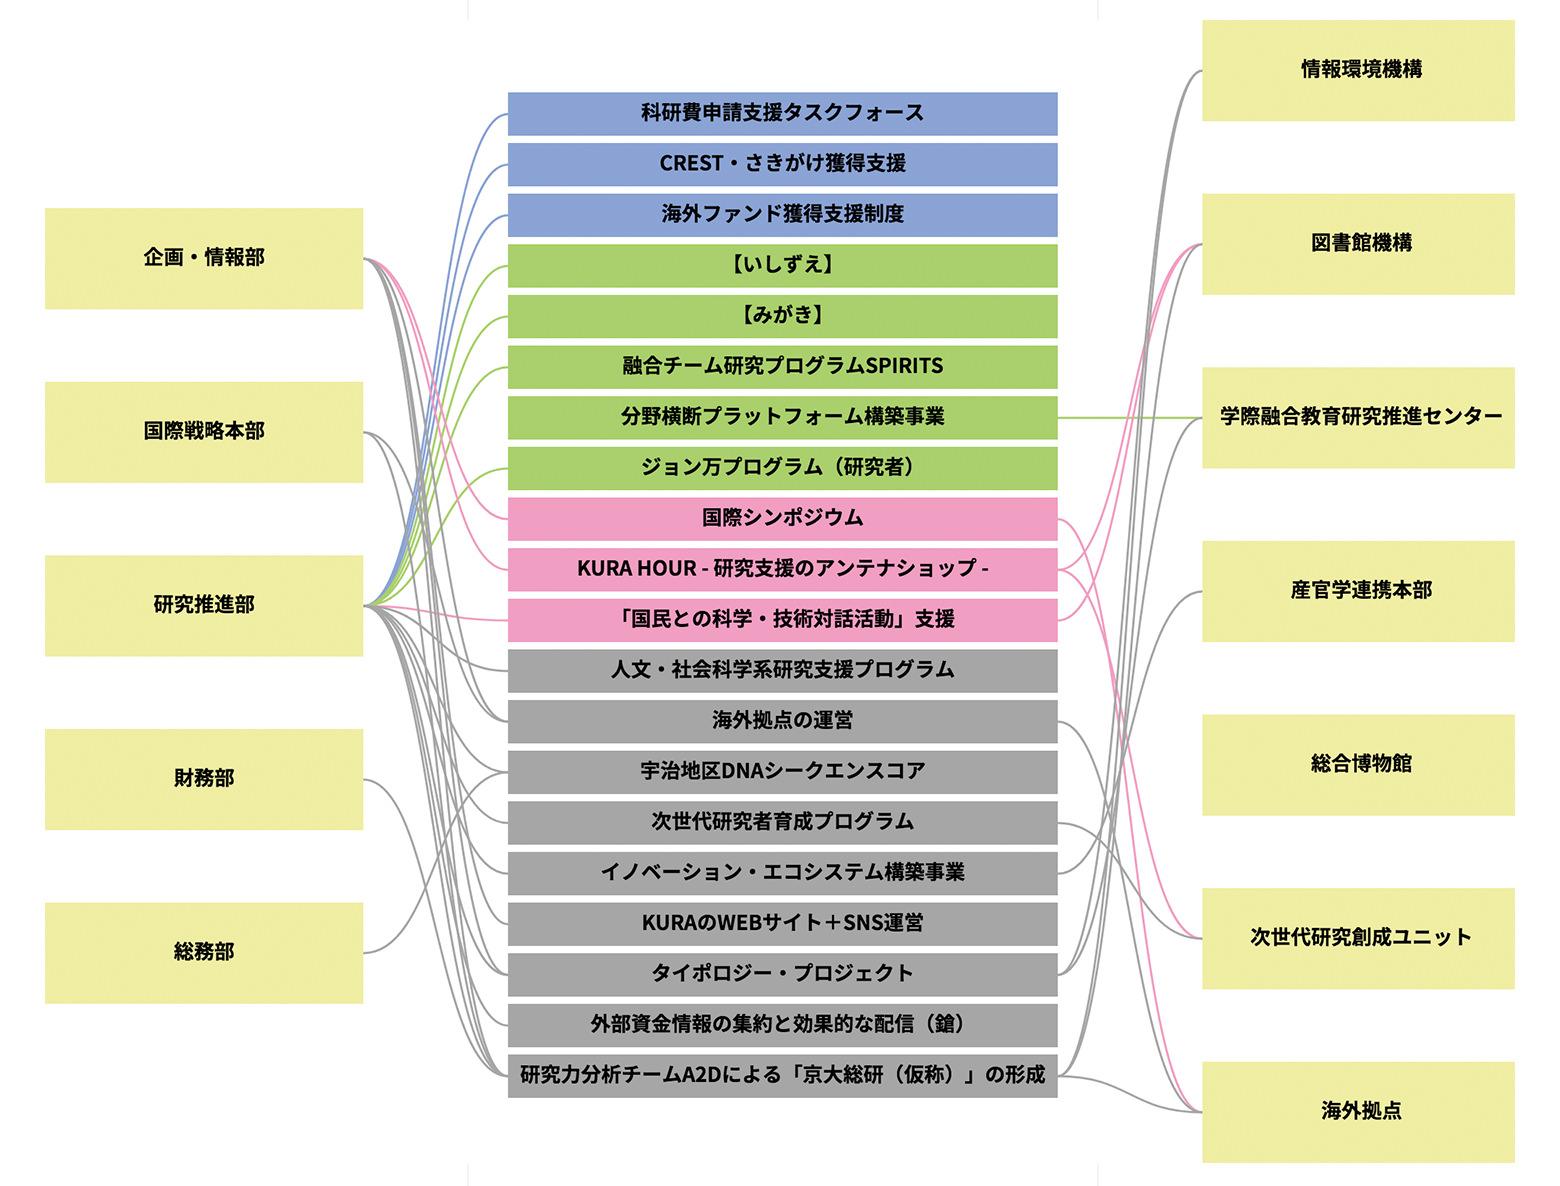 URA業務と学内組織との繋がりについての図